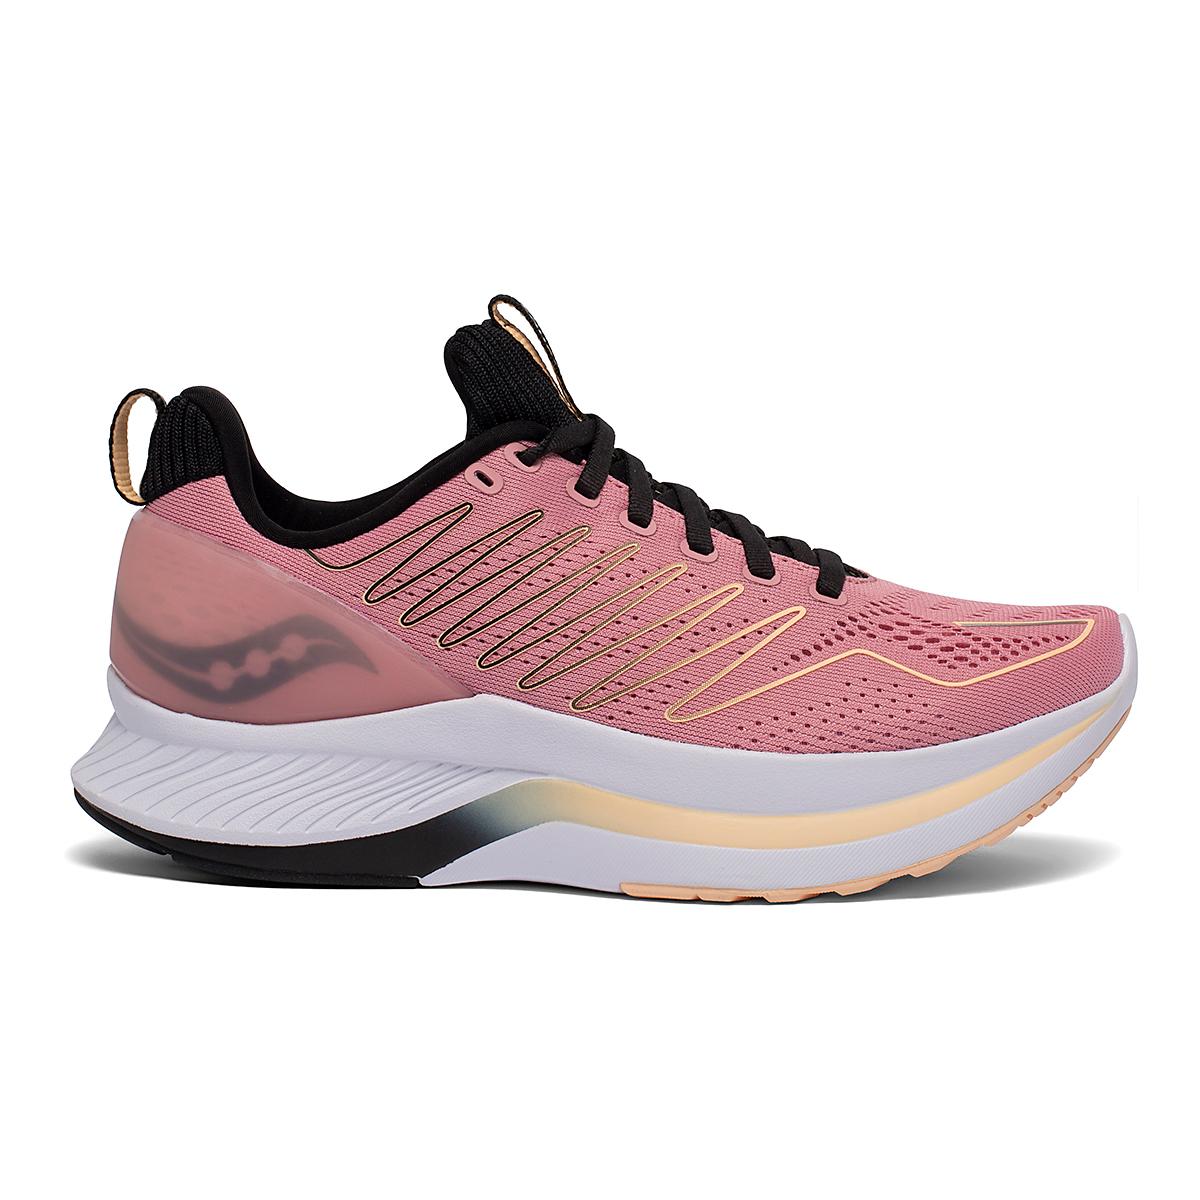 Women's Saucony Endorphin Shift Running Shoe - Color: Rosewater/Black - Size: 5 - Width: Regular, Rosewater/Black, large, image 1